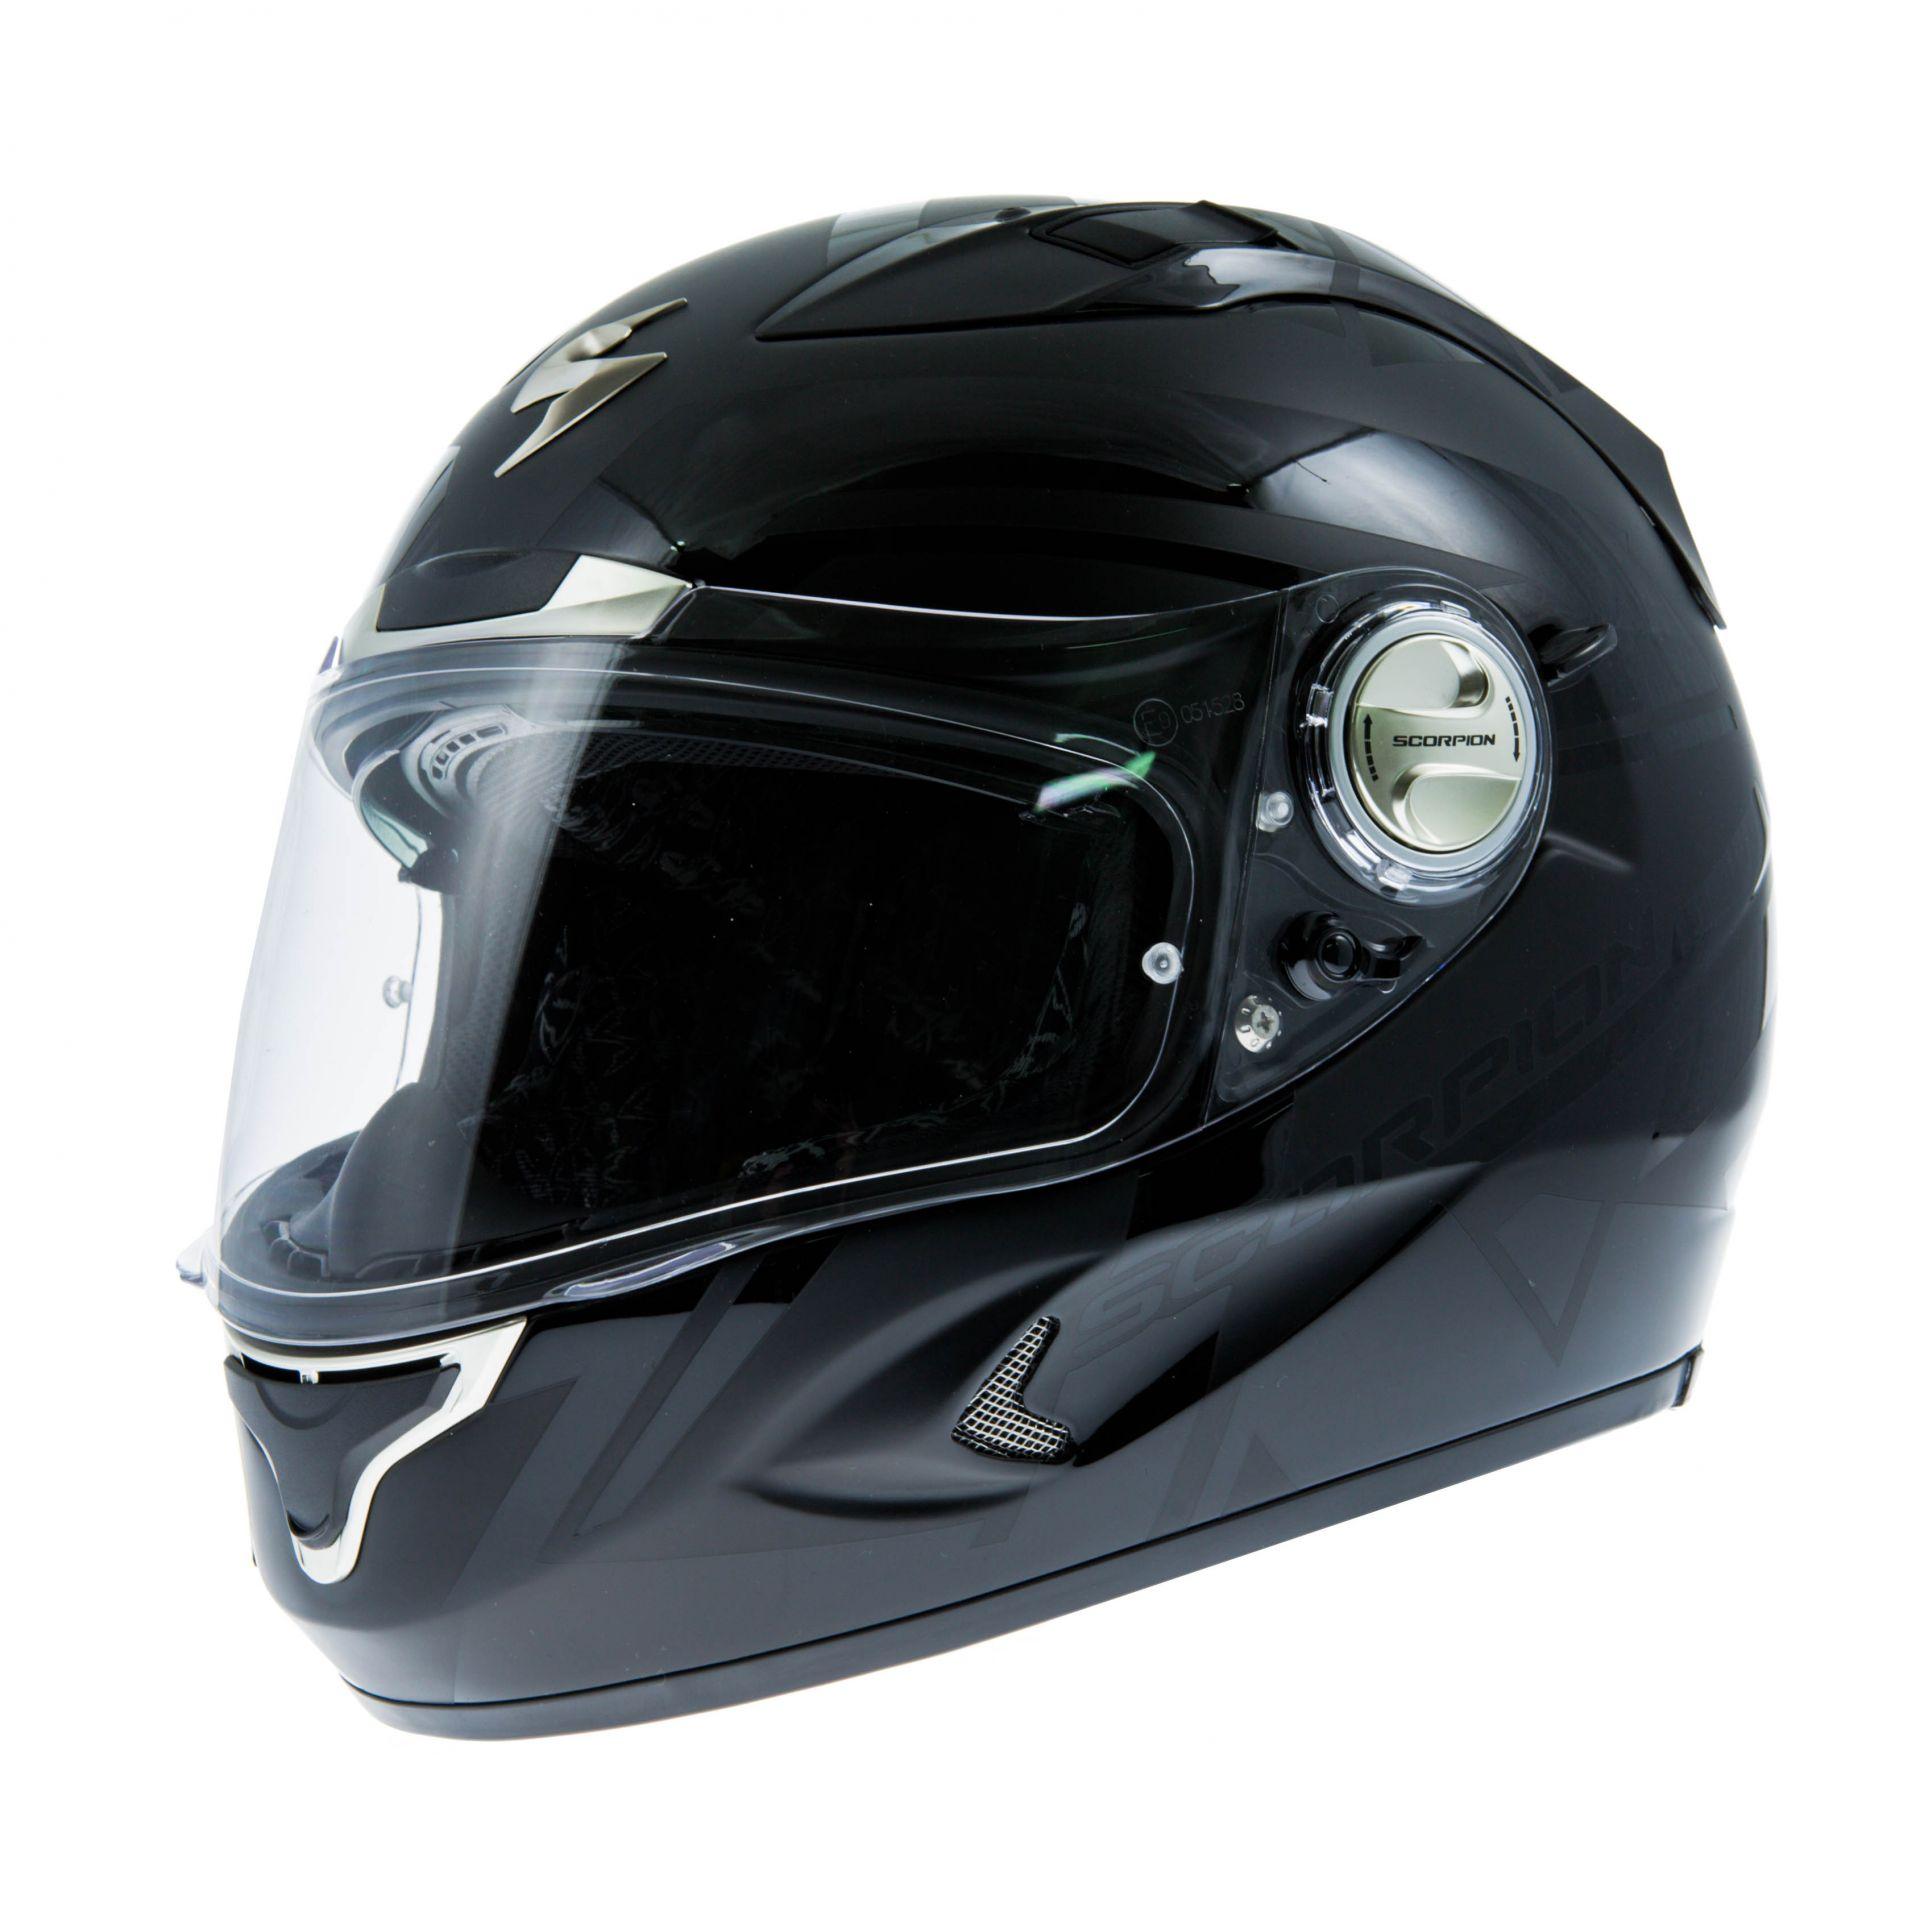 Casque intégral Scorpion EXO-1000 AIR RAFALE Noir Noir mat - XL